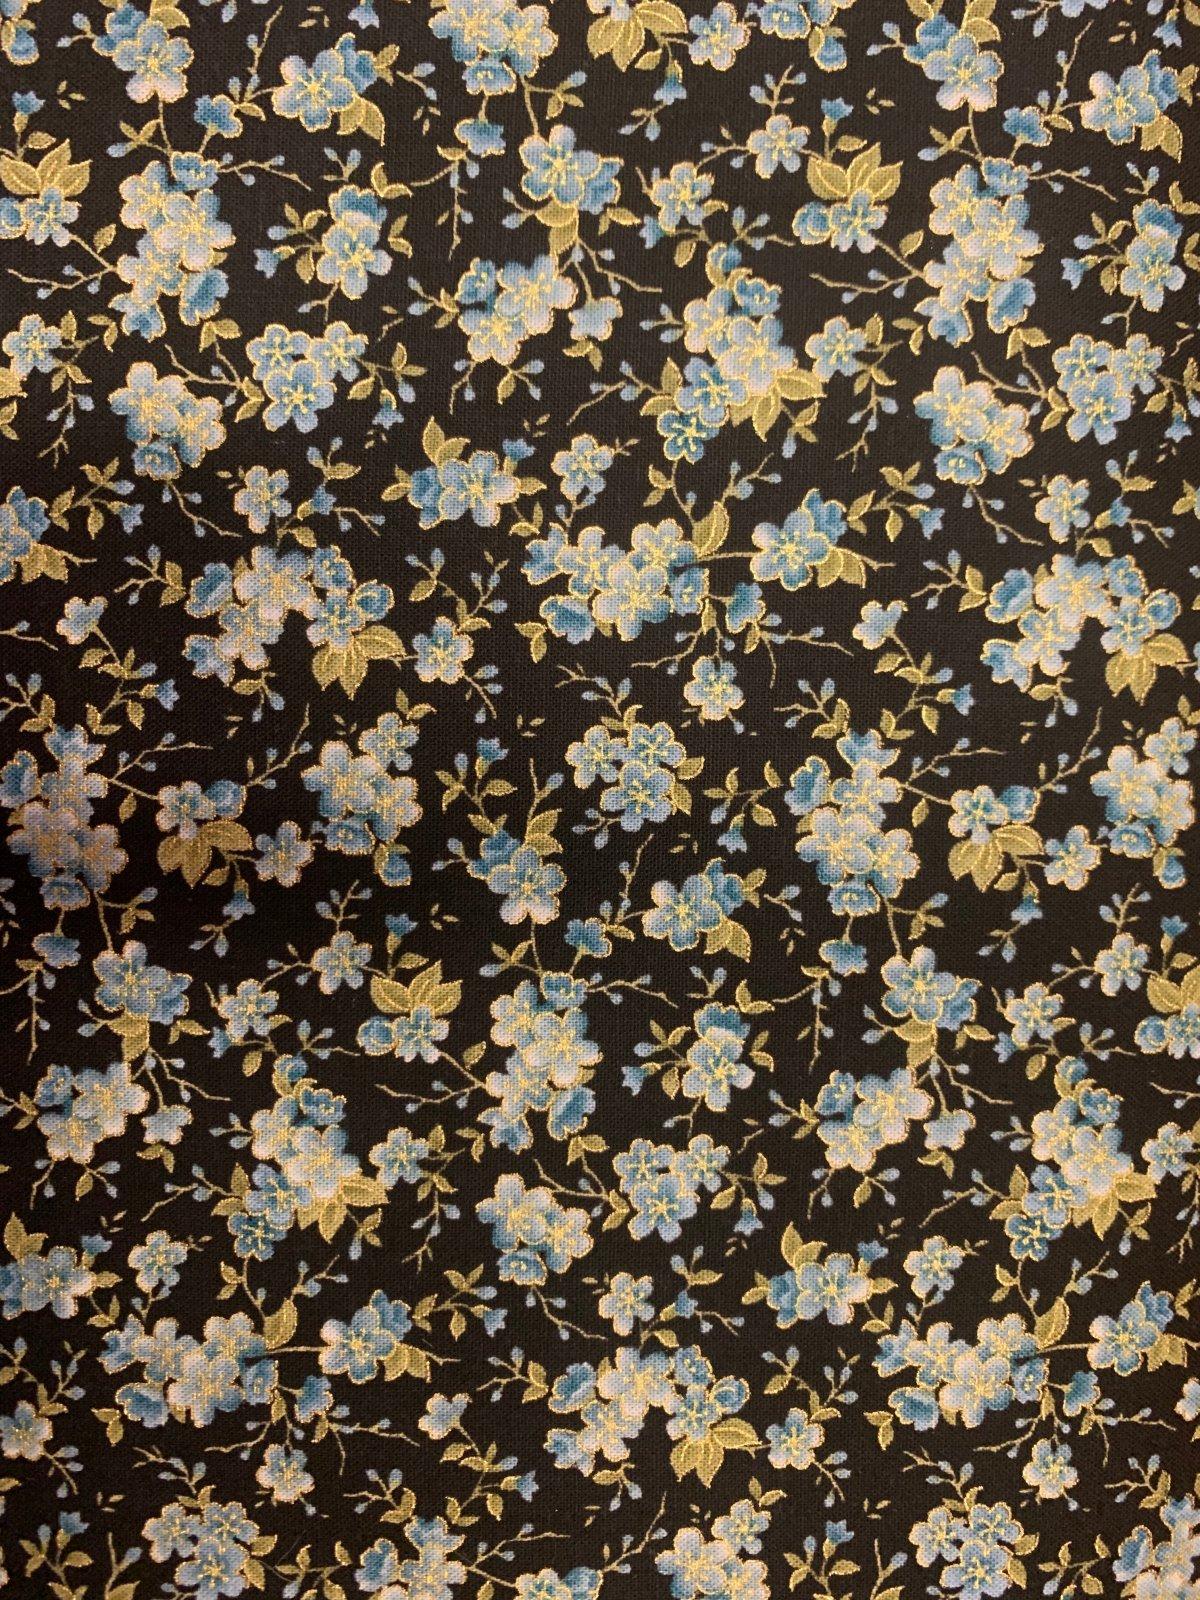 Calico Blue C7605 Black Floral